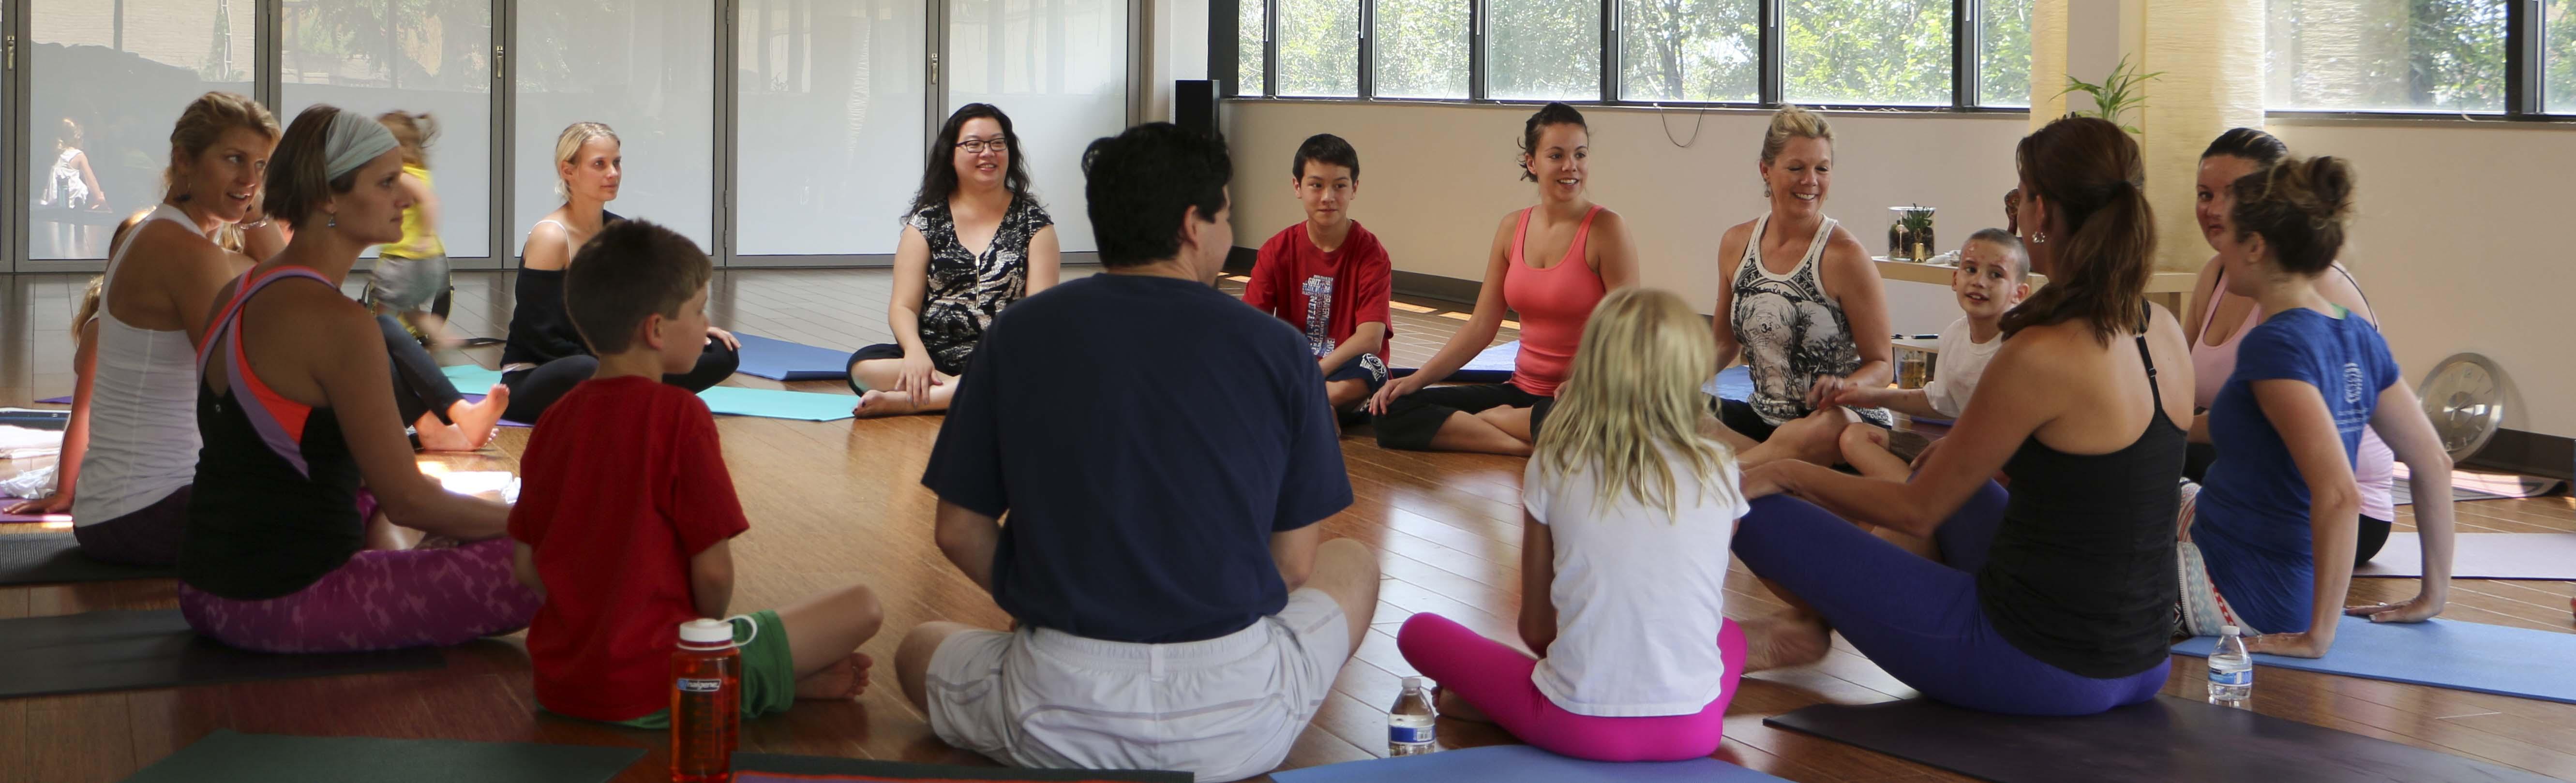 Radiant Family Yoga